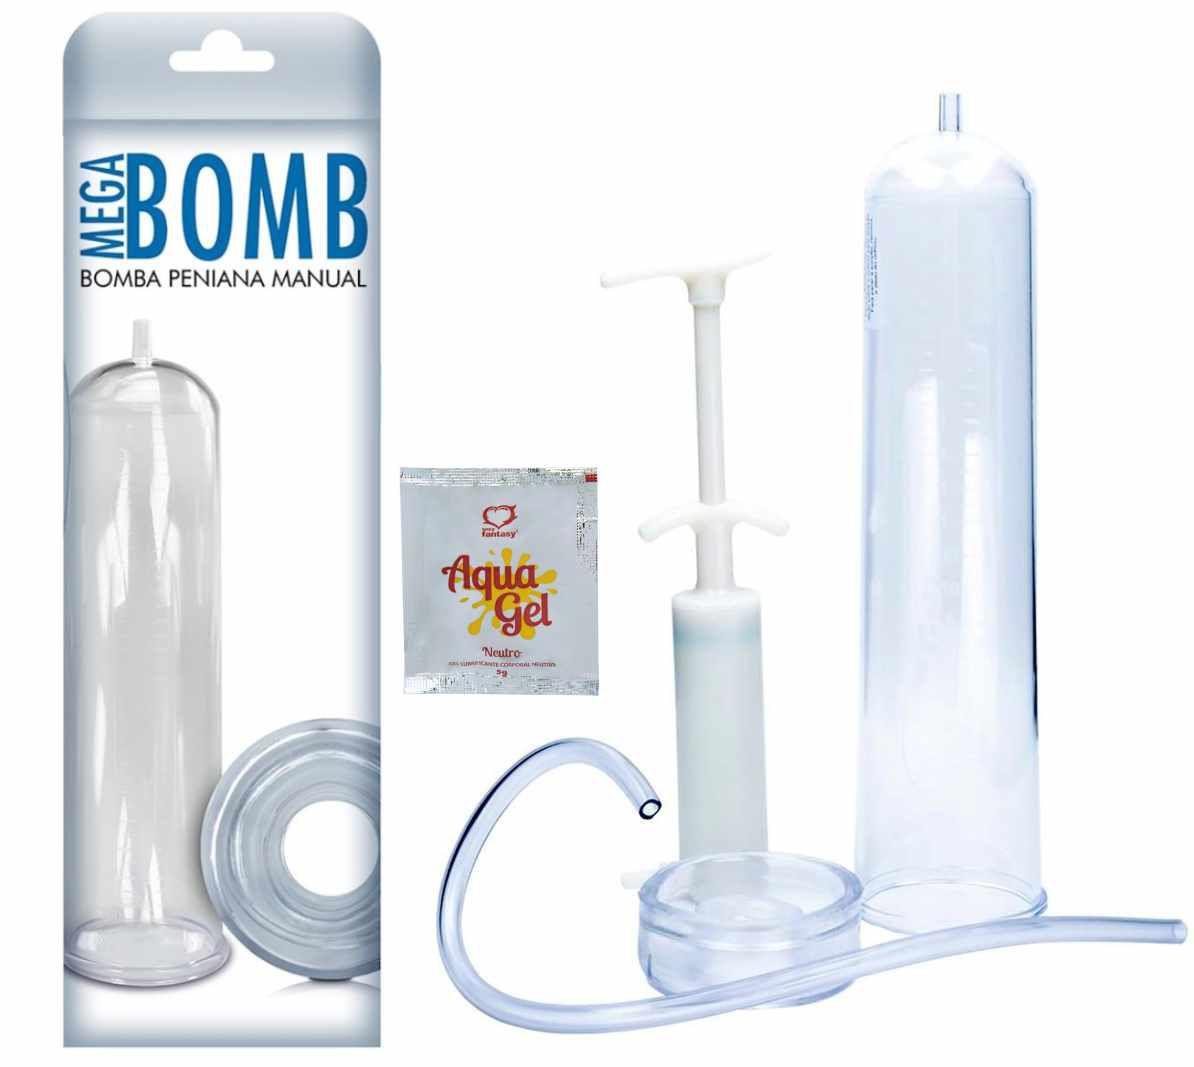 Bomba Peniana Manual  Mega Bomb